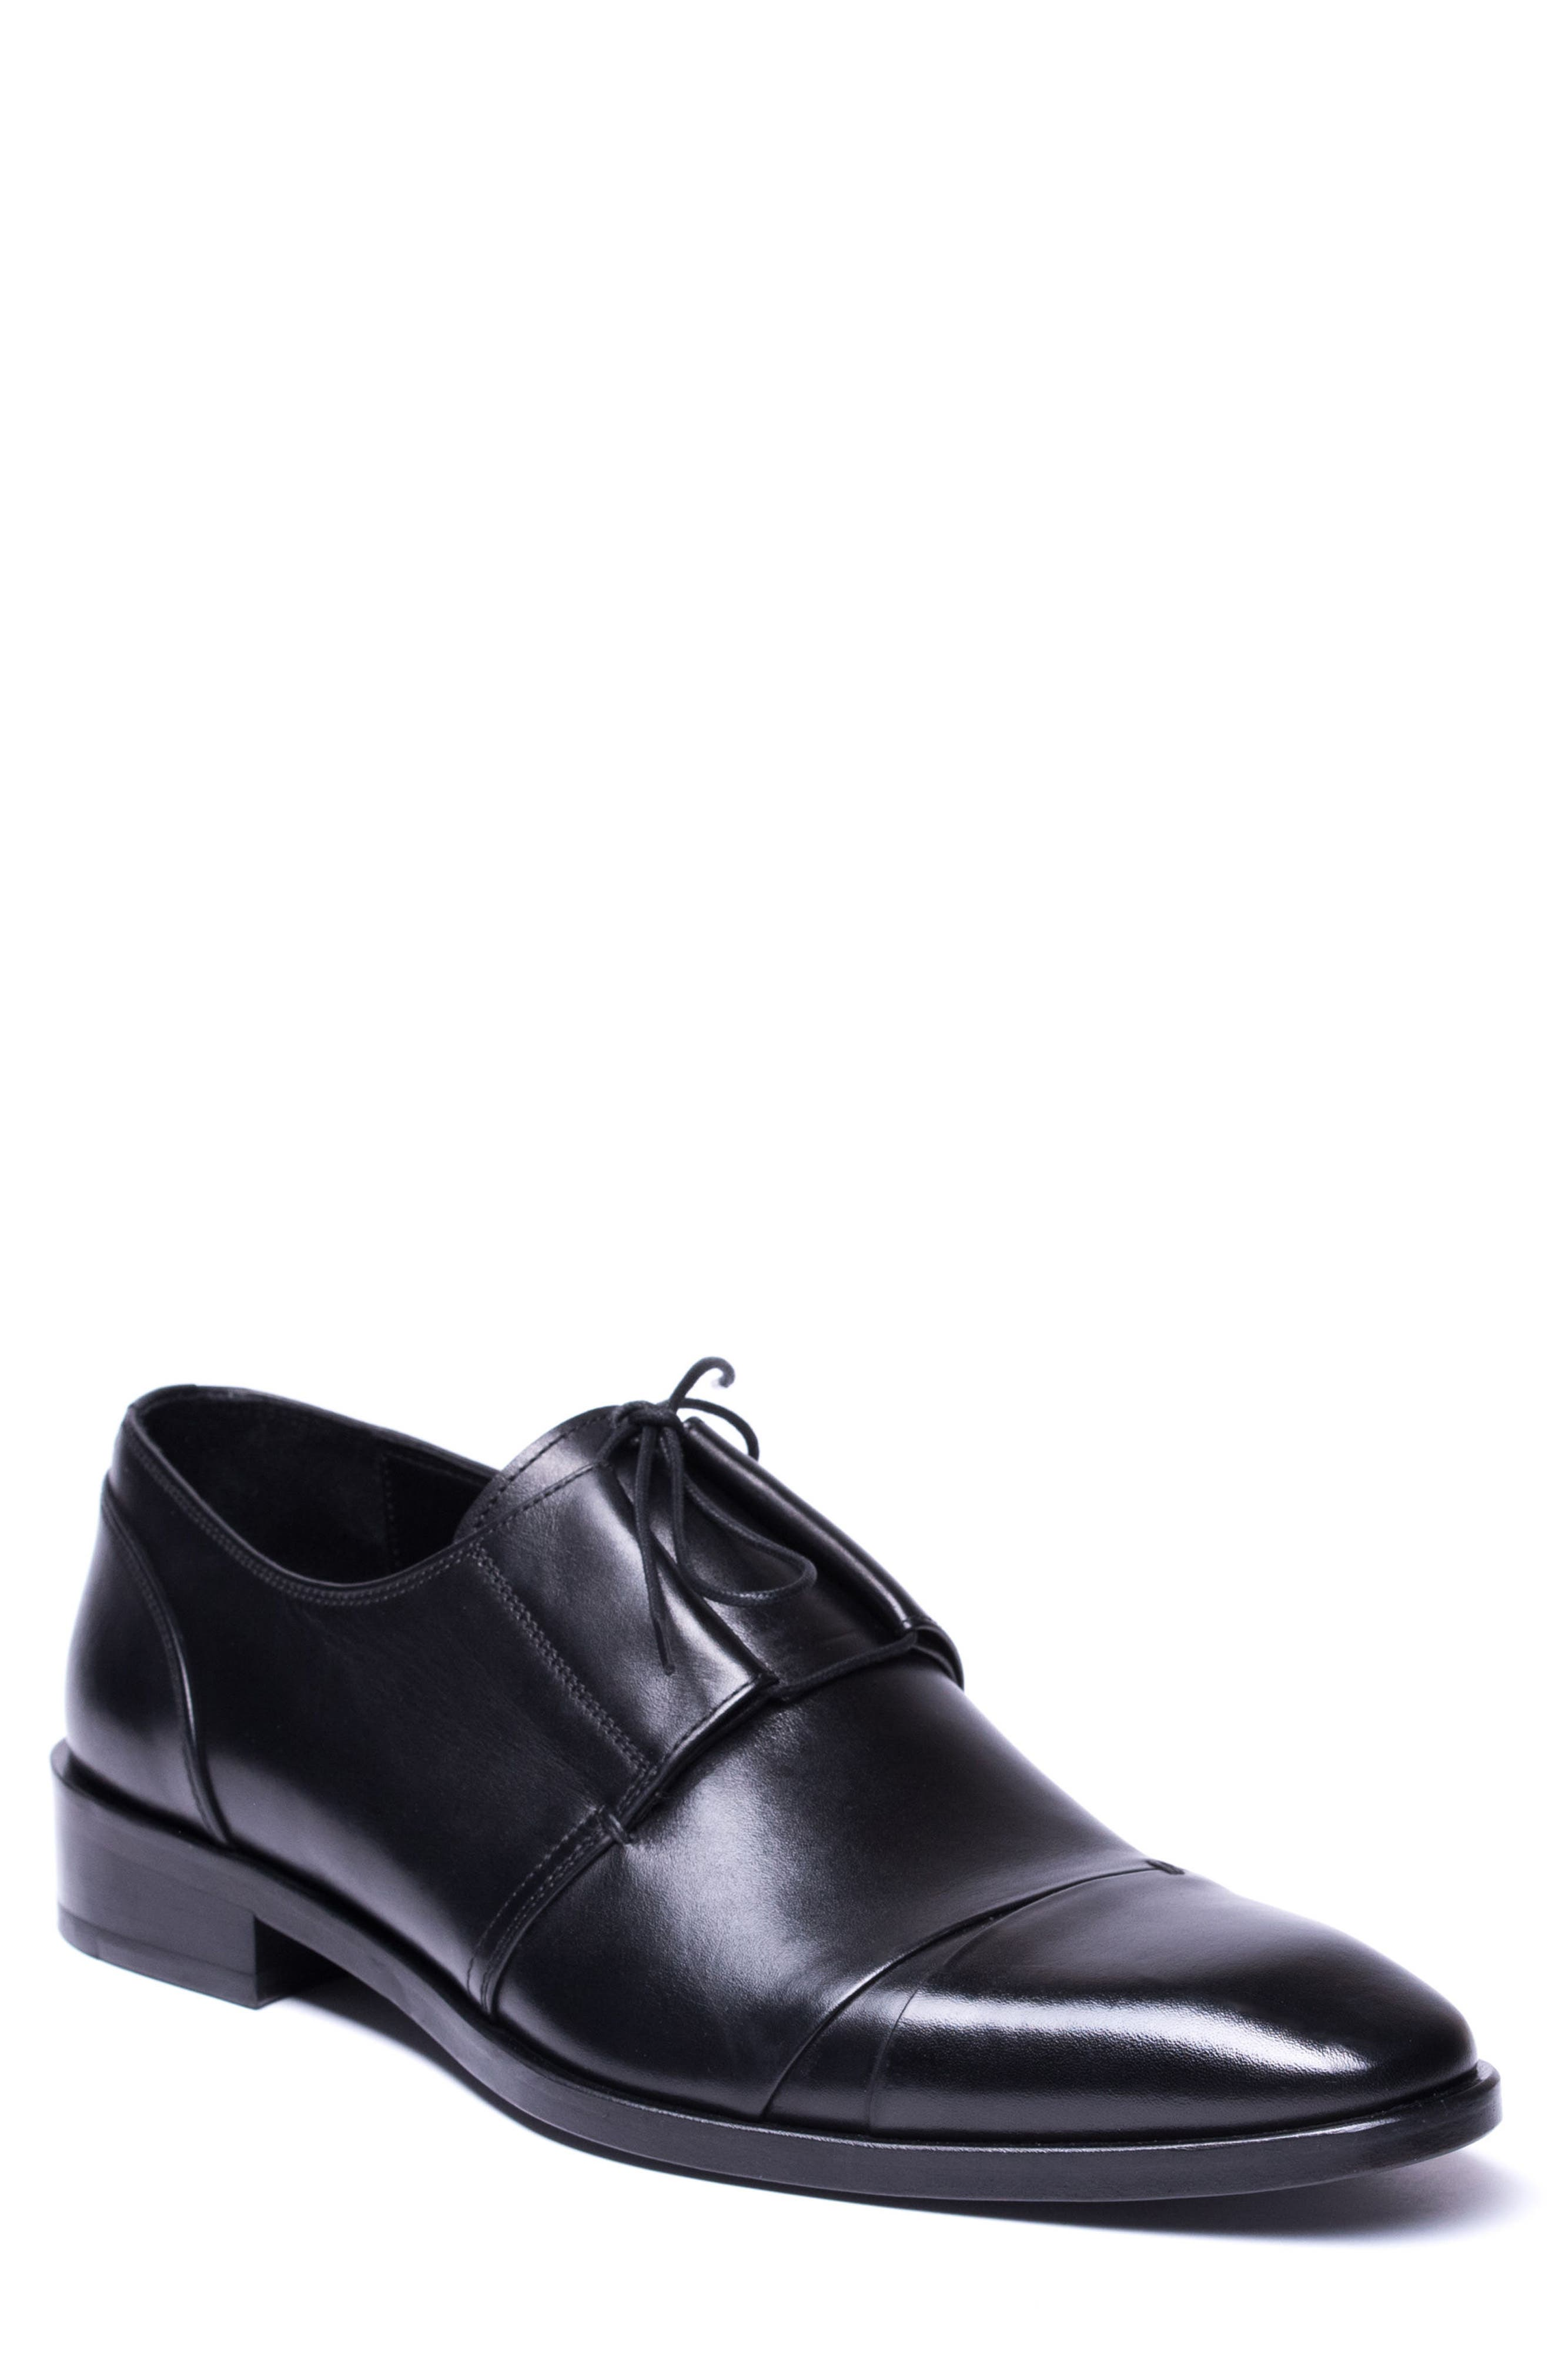 Danny Cap Toe Derby,                         Main,                         color, Black Leather